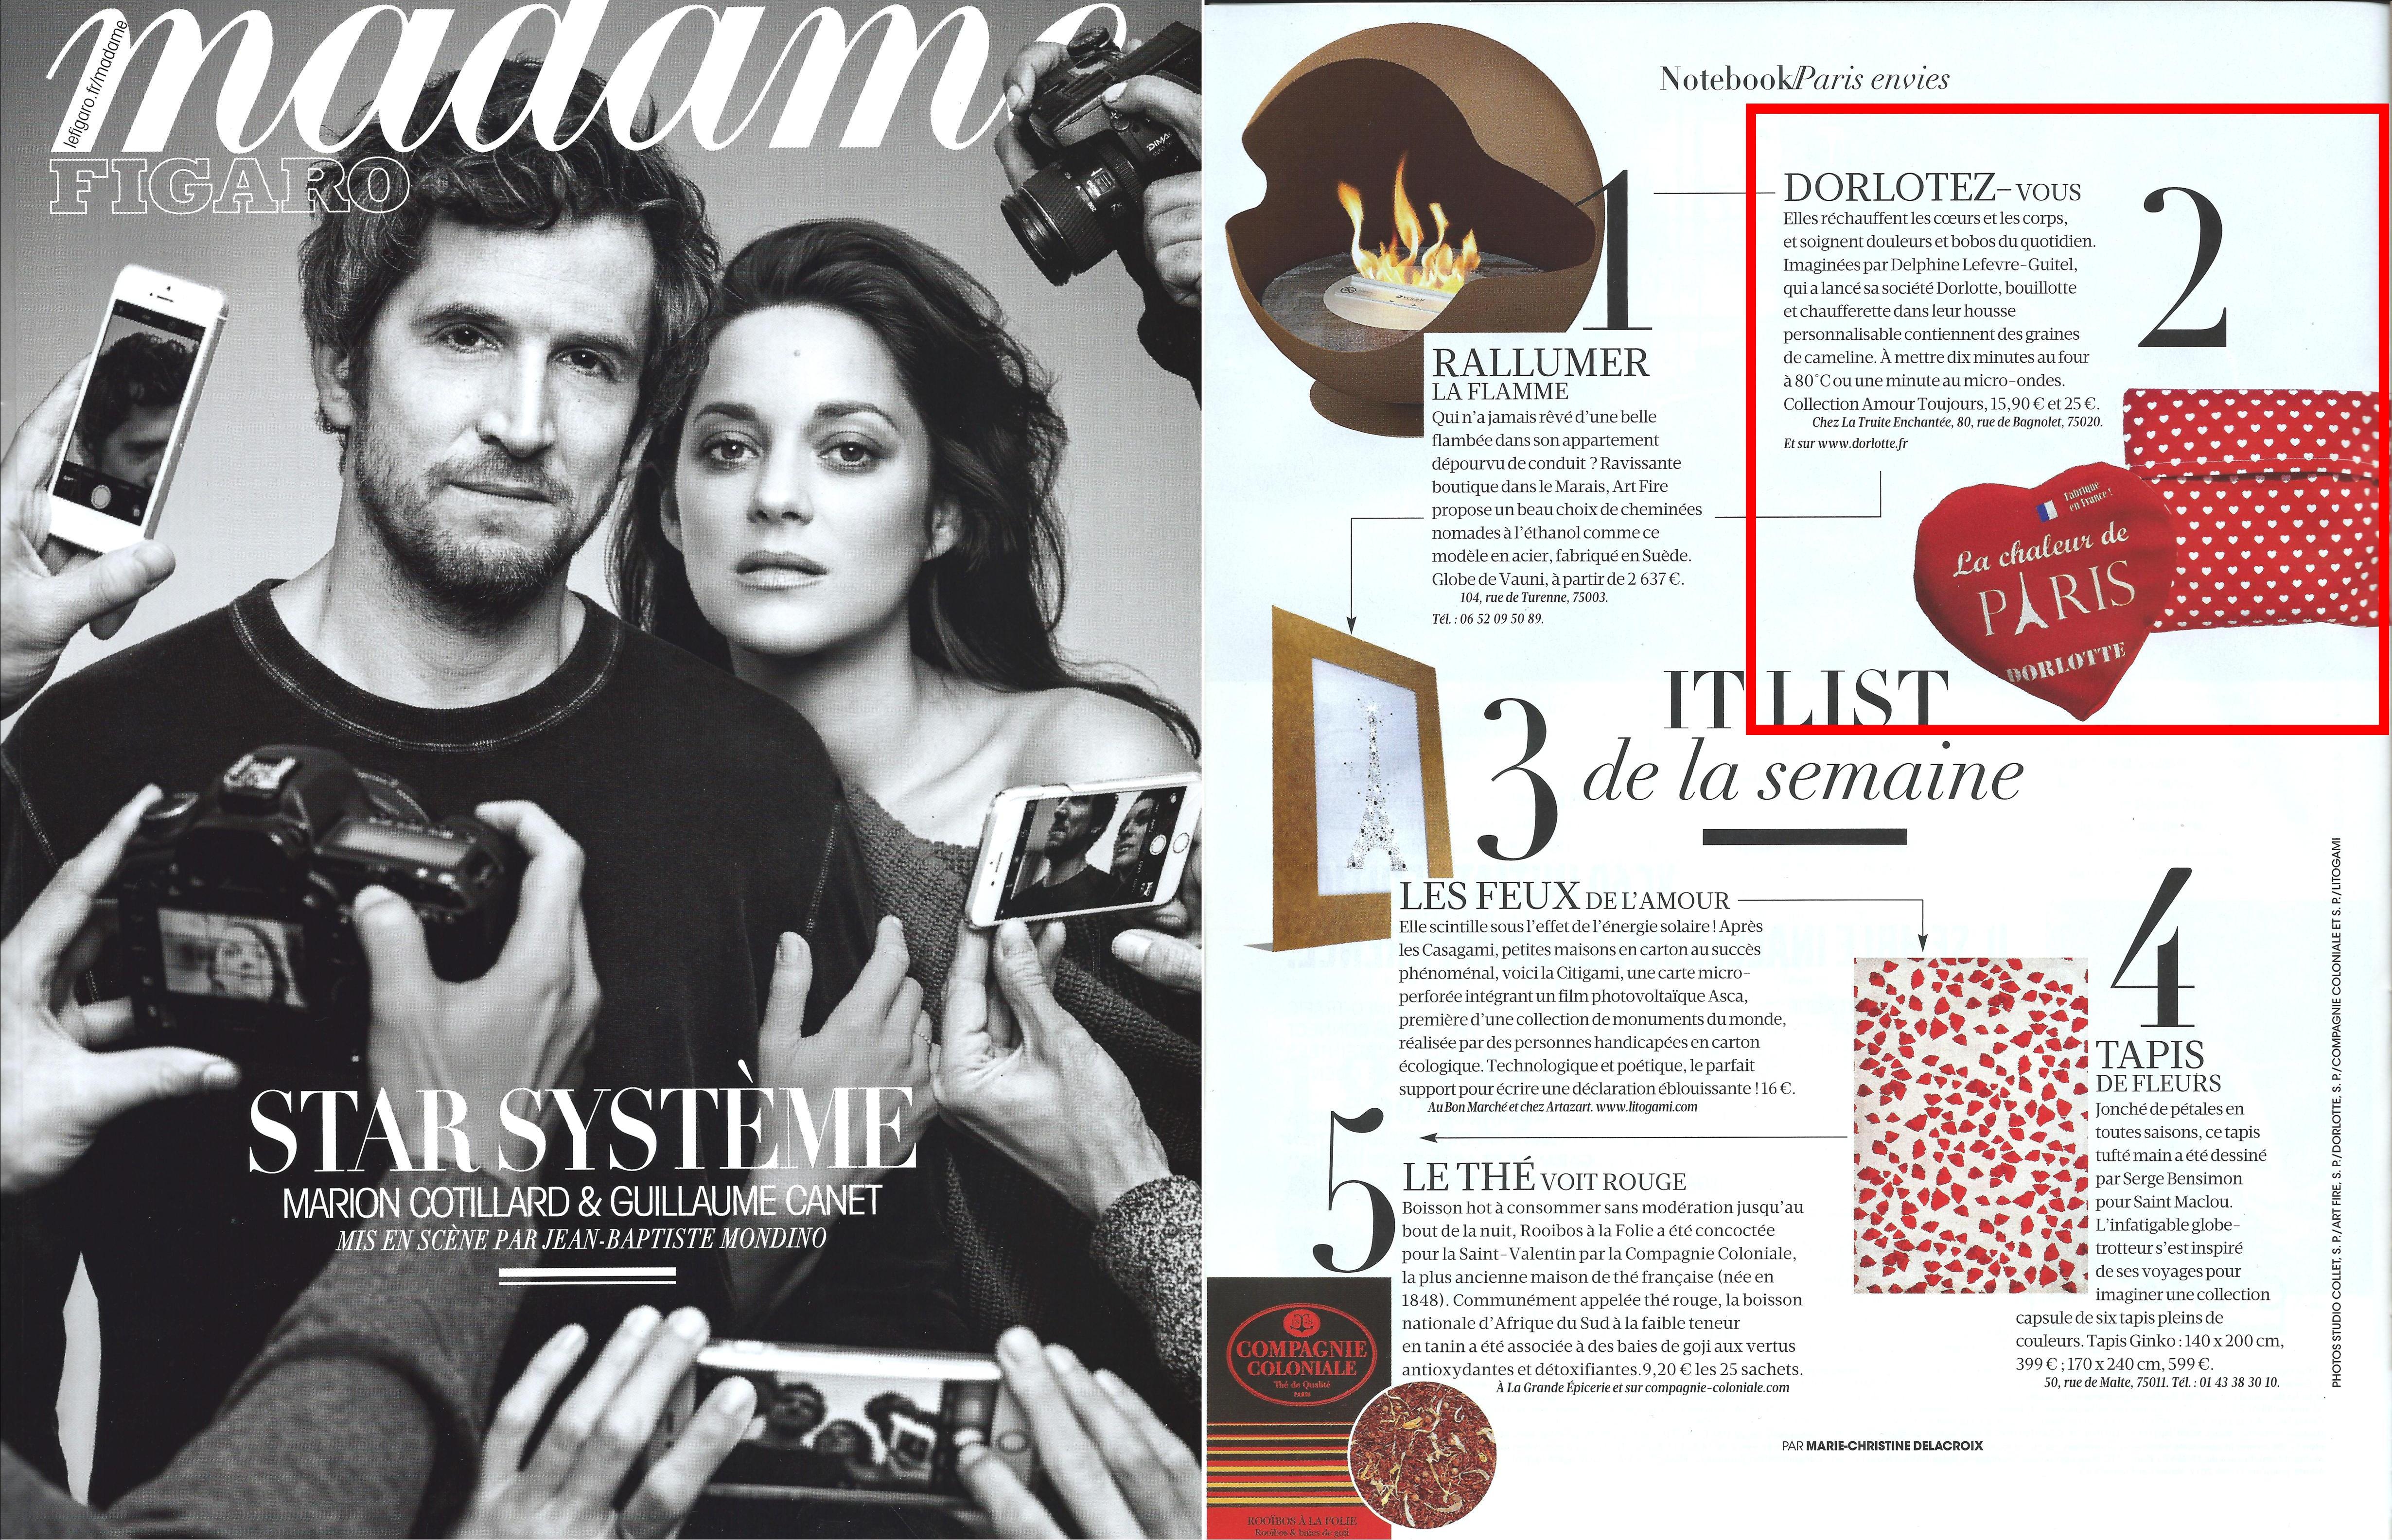 La bouillotte coeur Dorlotte dans un article de Madame Figaro